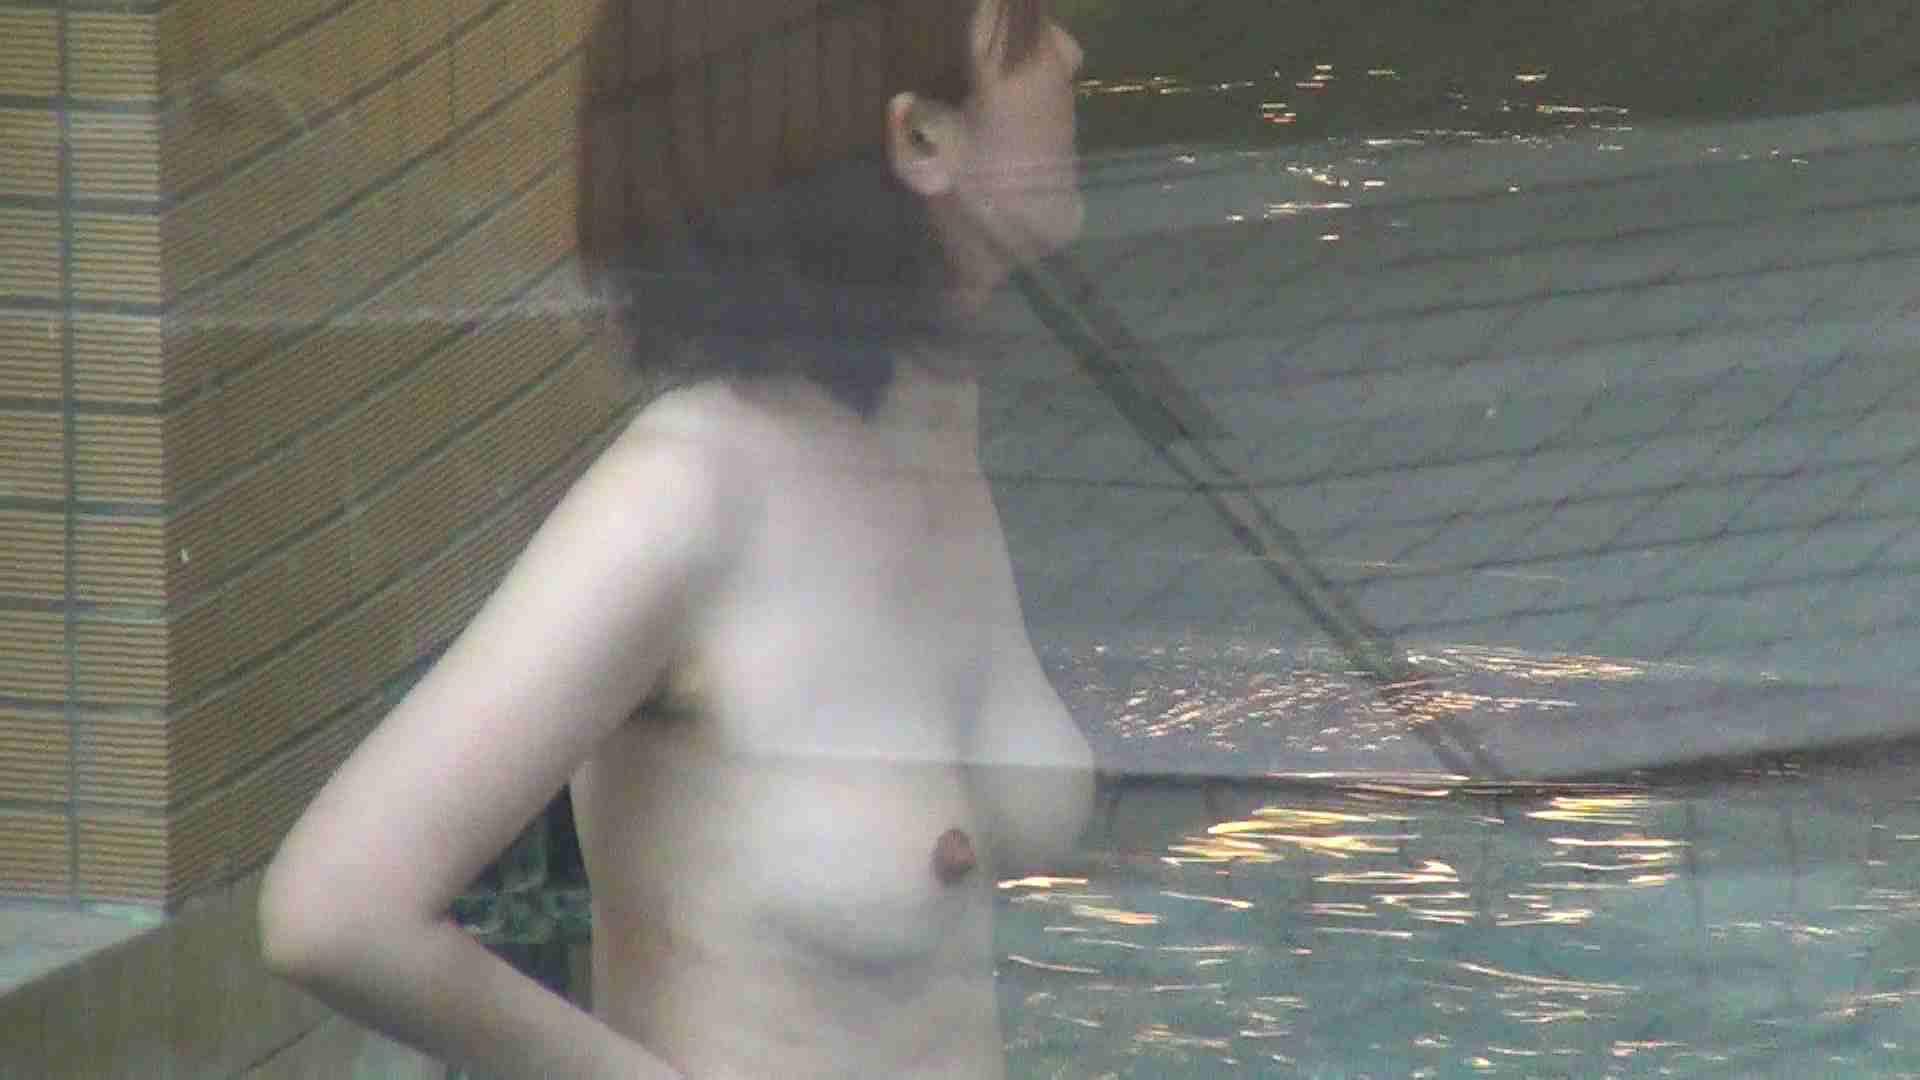 Aquaな露天風呂Vol.297 露天 おまんこ無修正動画無料 13pic 8